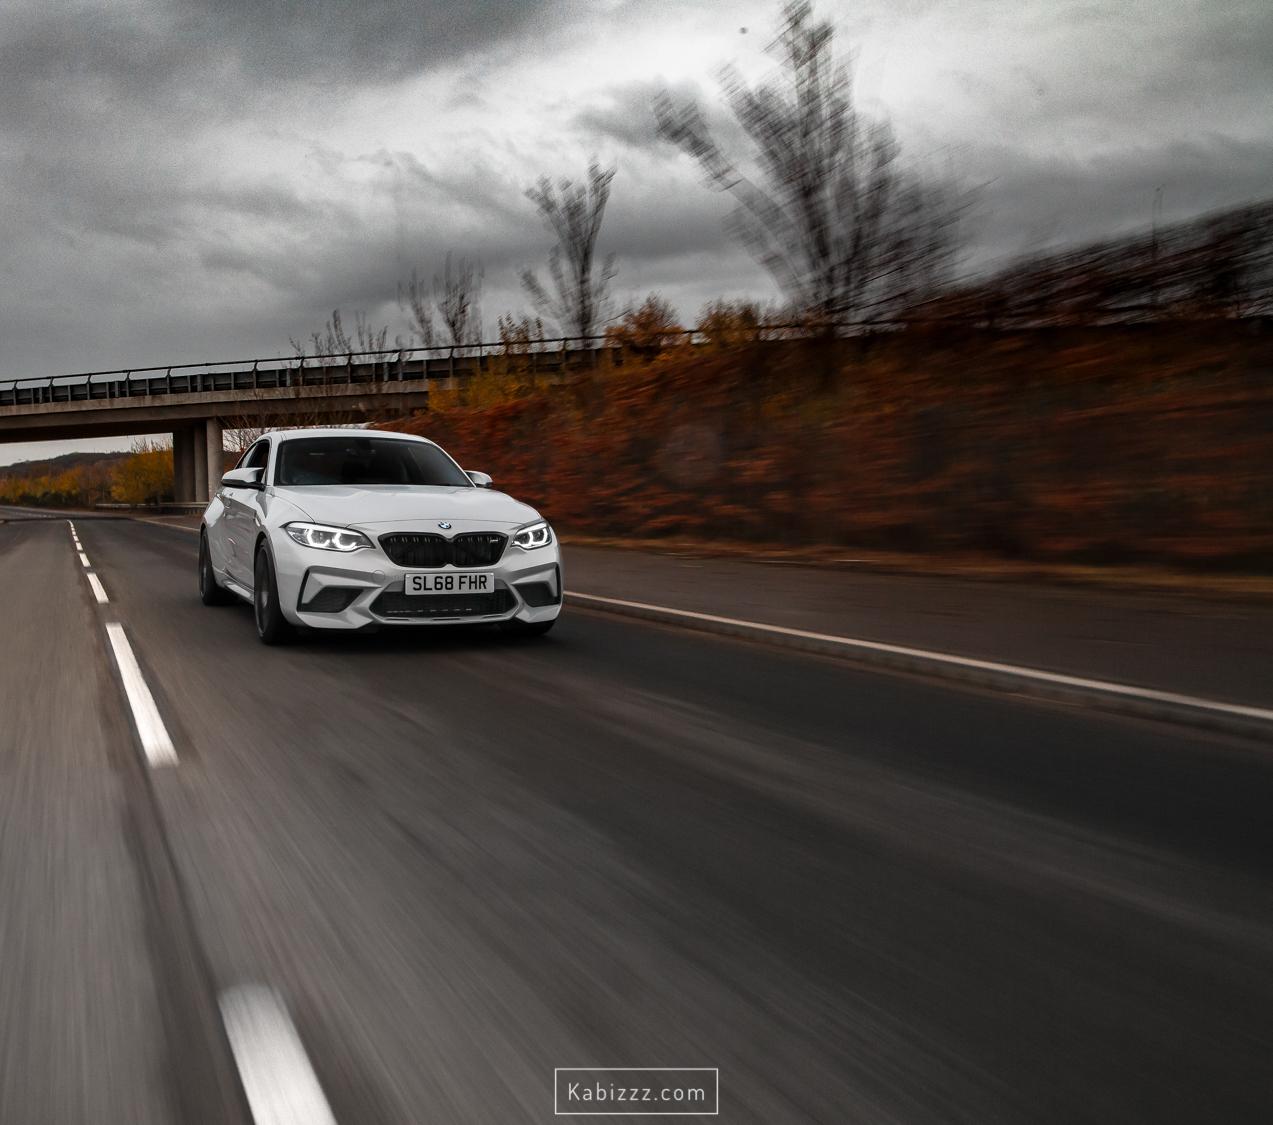 bmw_m2_competition_automotive_photography_kabizzz-4.jpg